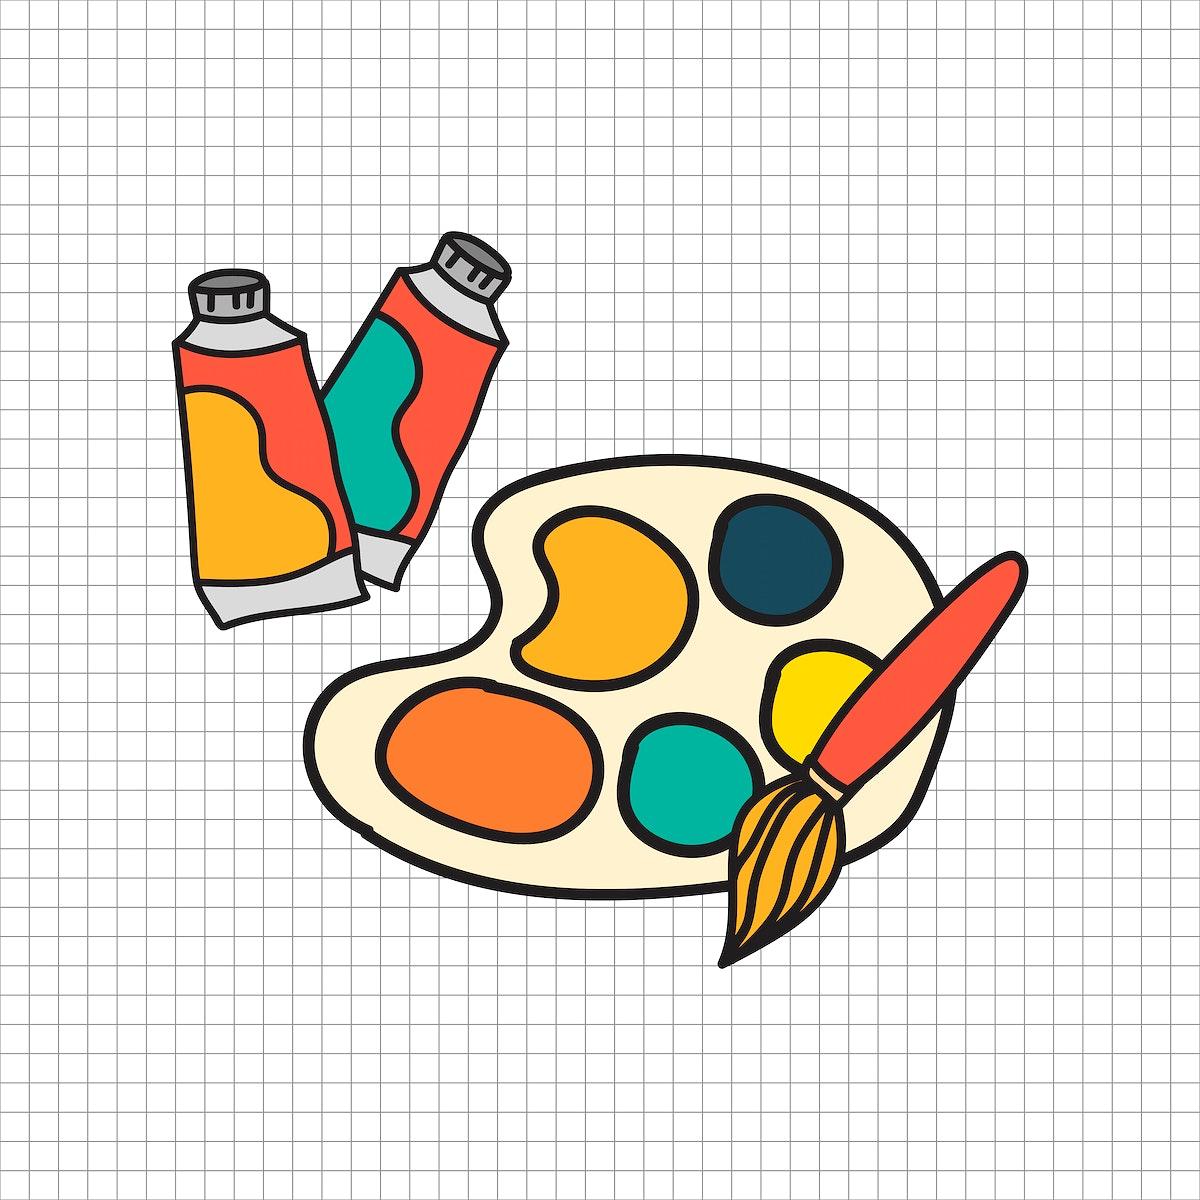 Stationary illustration drawing style